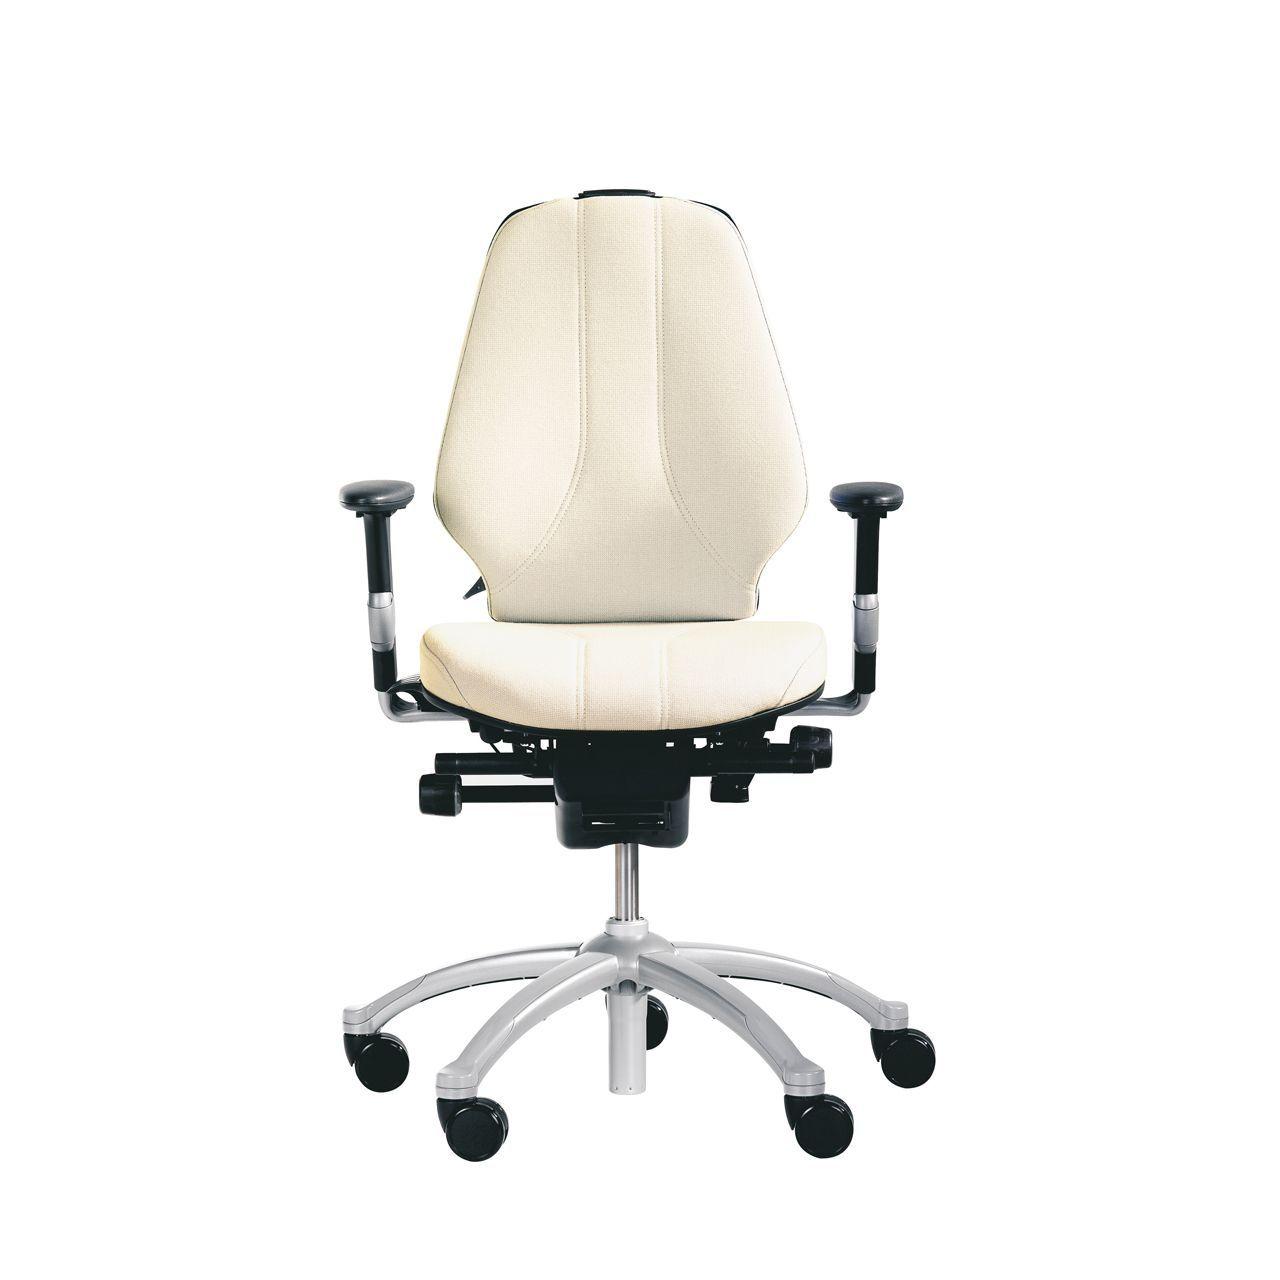 rh logic 300 24 7 ergonomische bureaustoel STKARH304 Voorkant